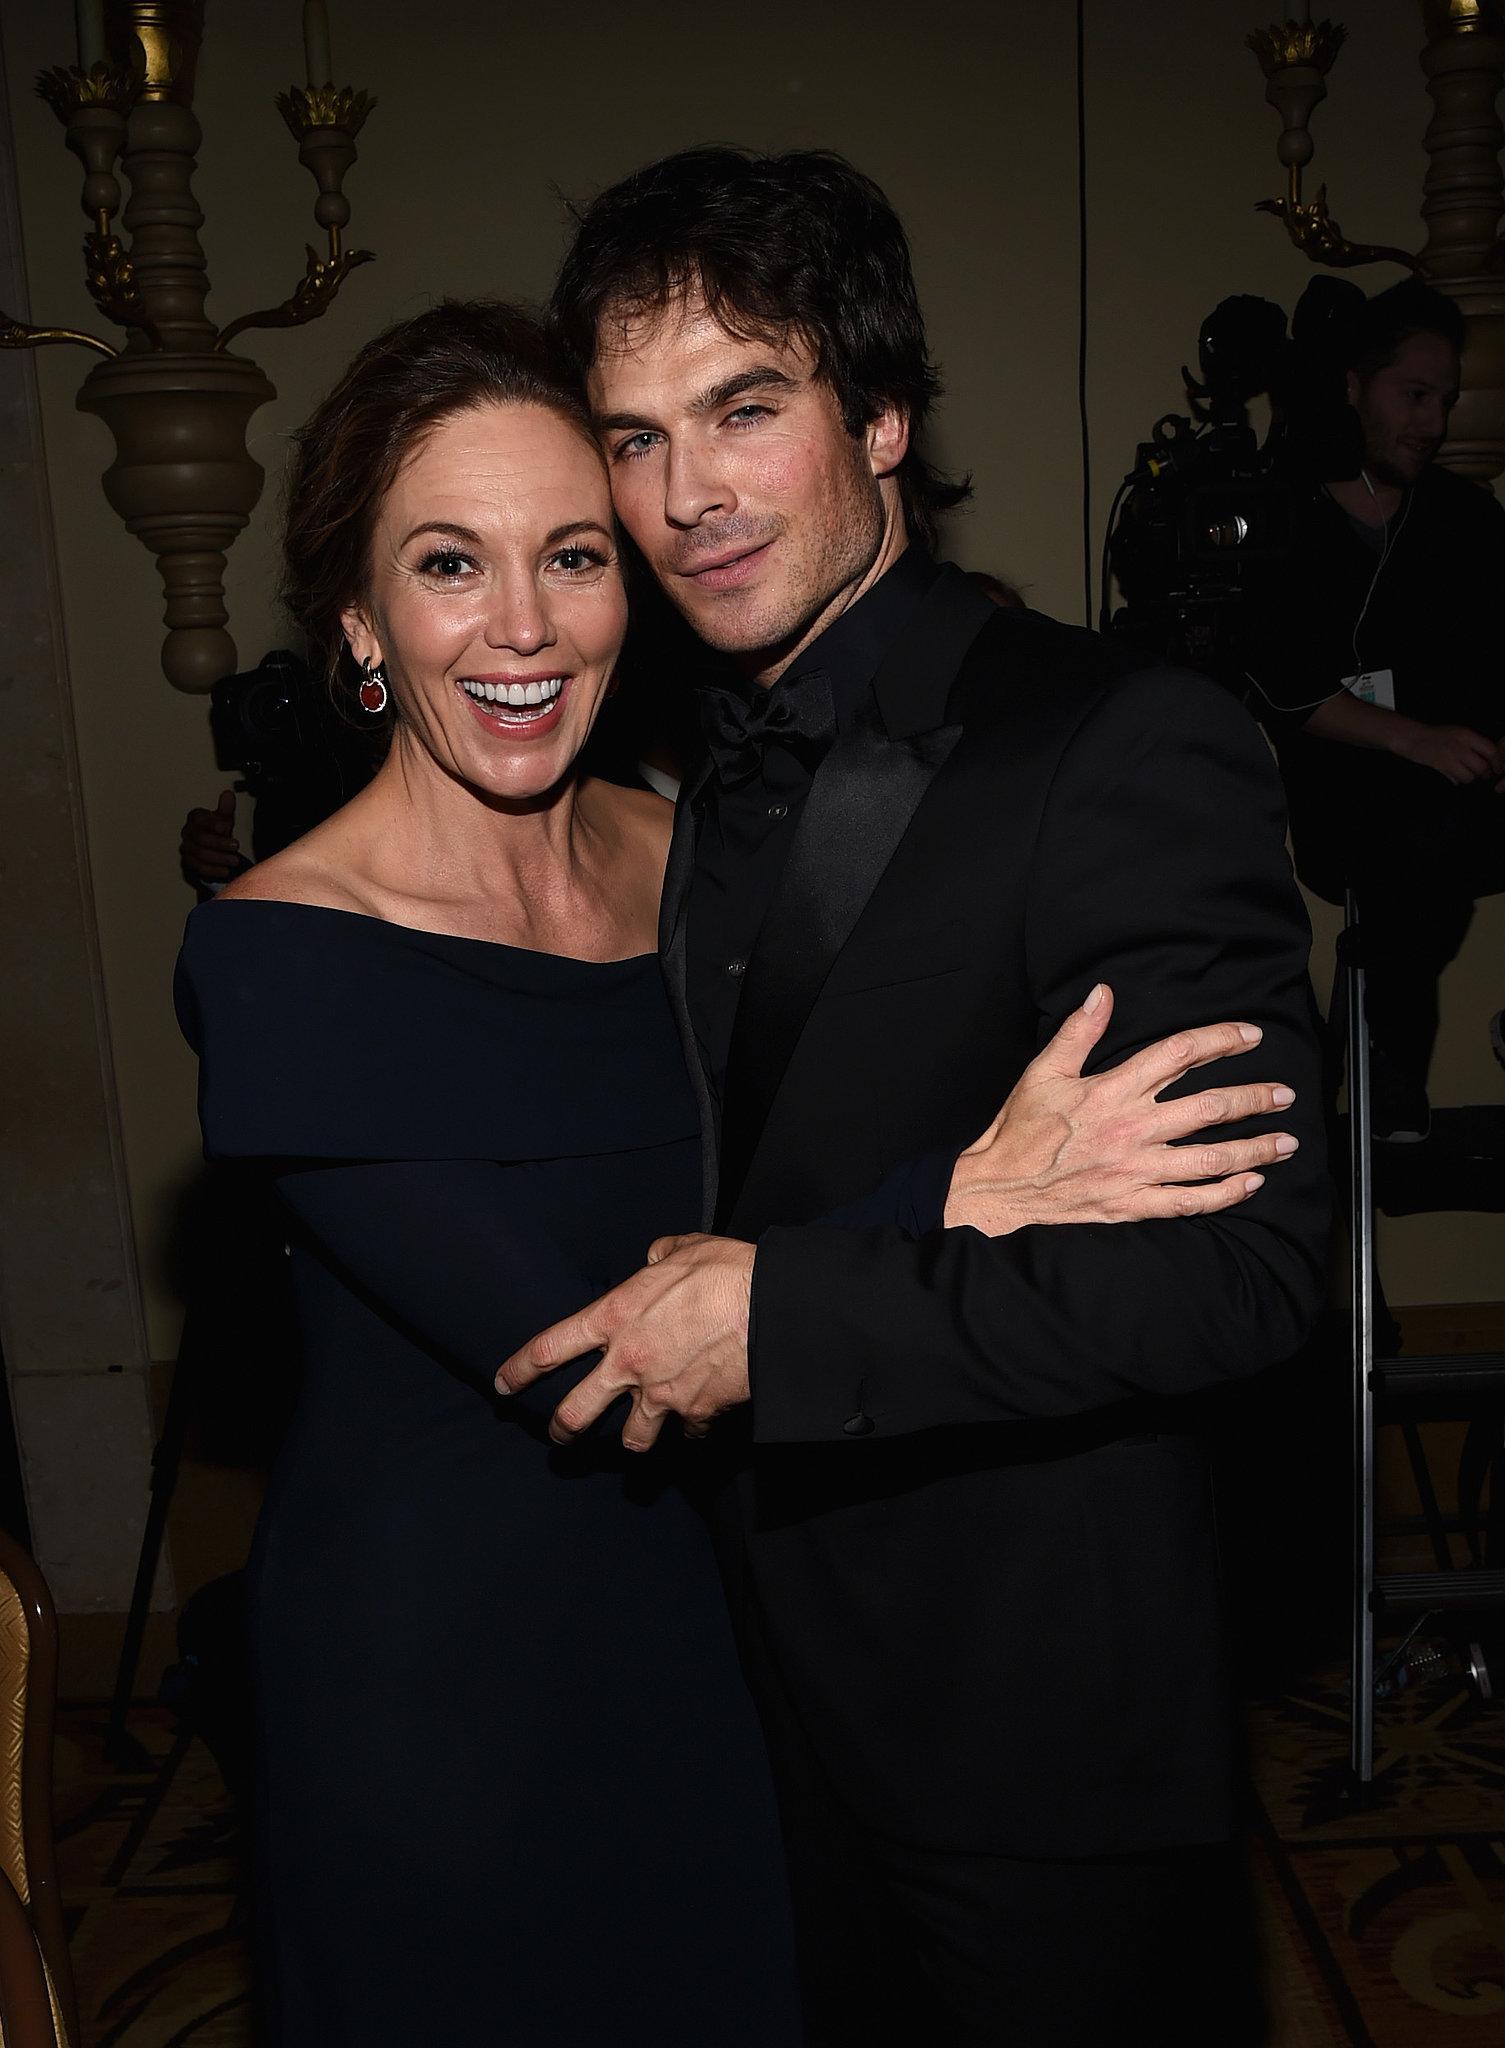 Ian Somerholder smoldered while Diane Lane smiled at Heifer International's Beyond Hunger gala in Beverly Hills on Friday.